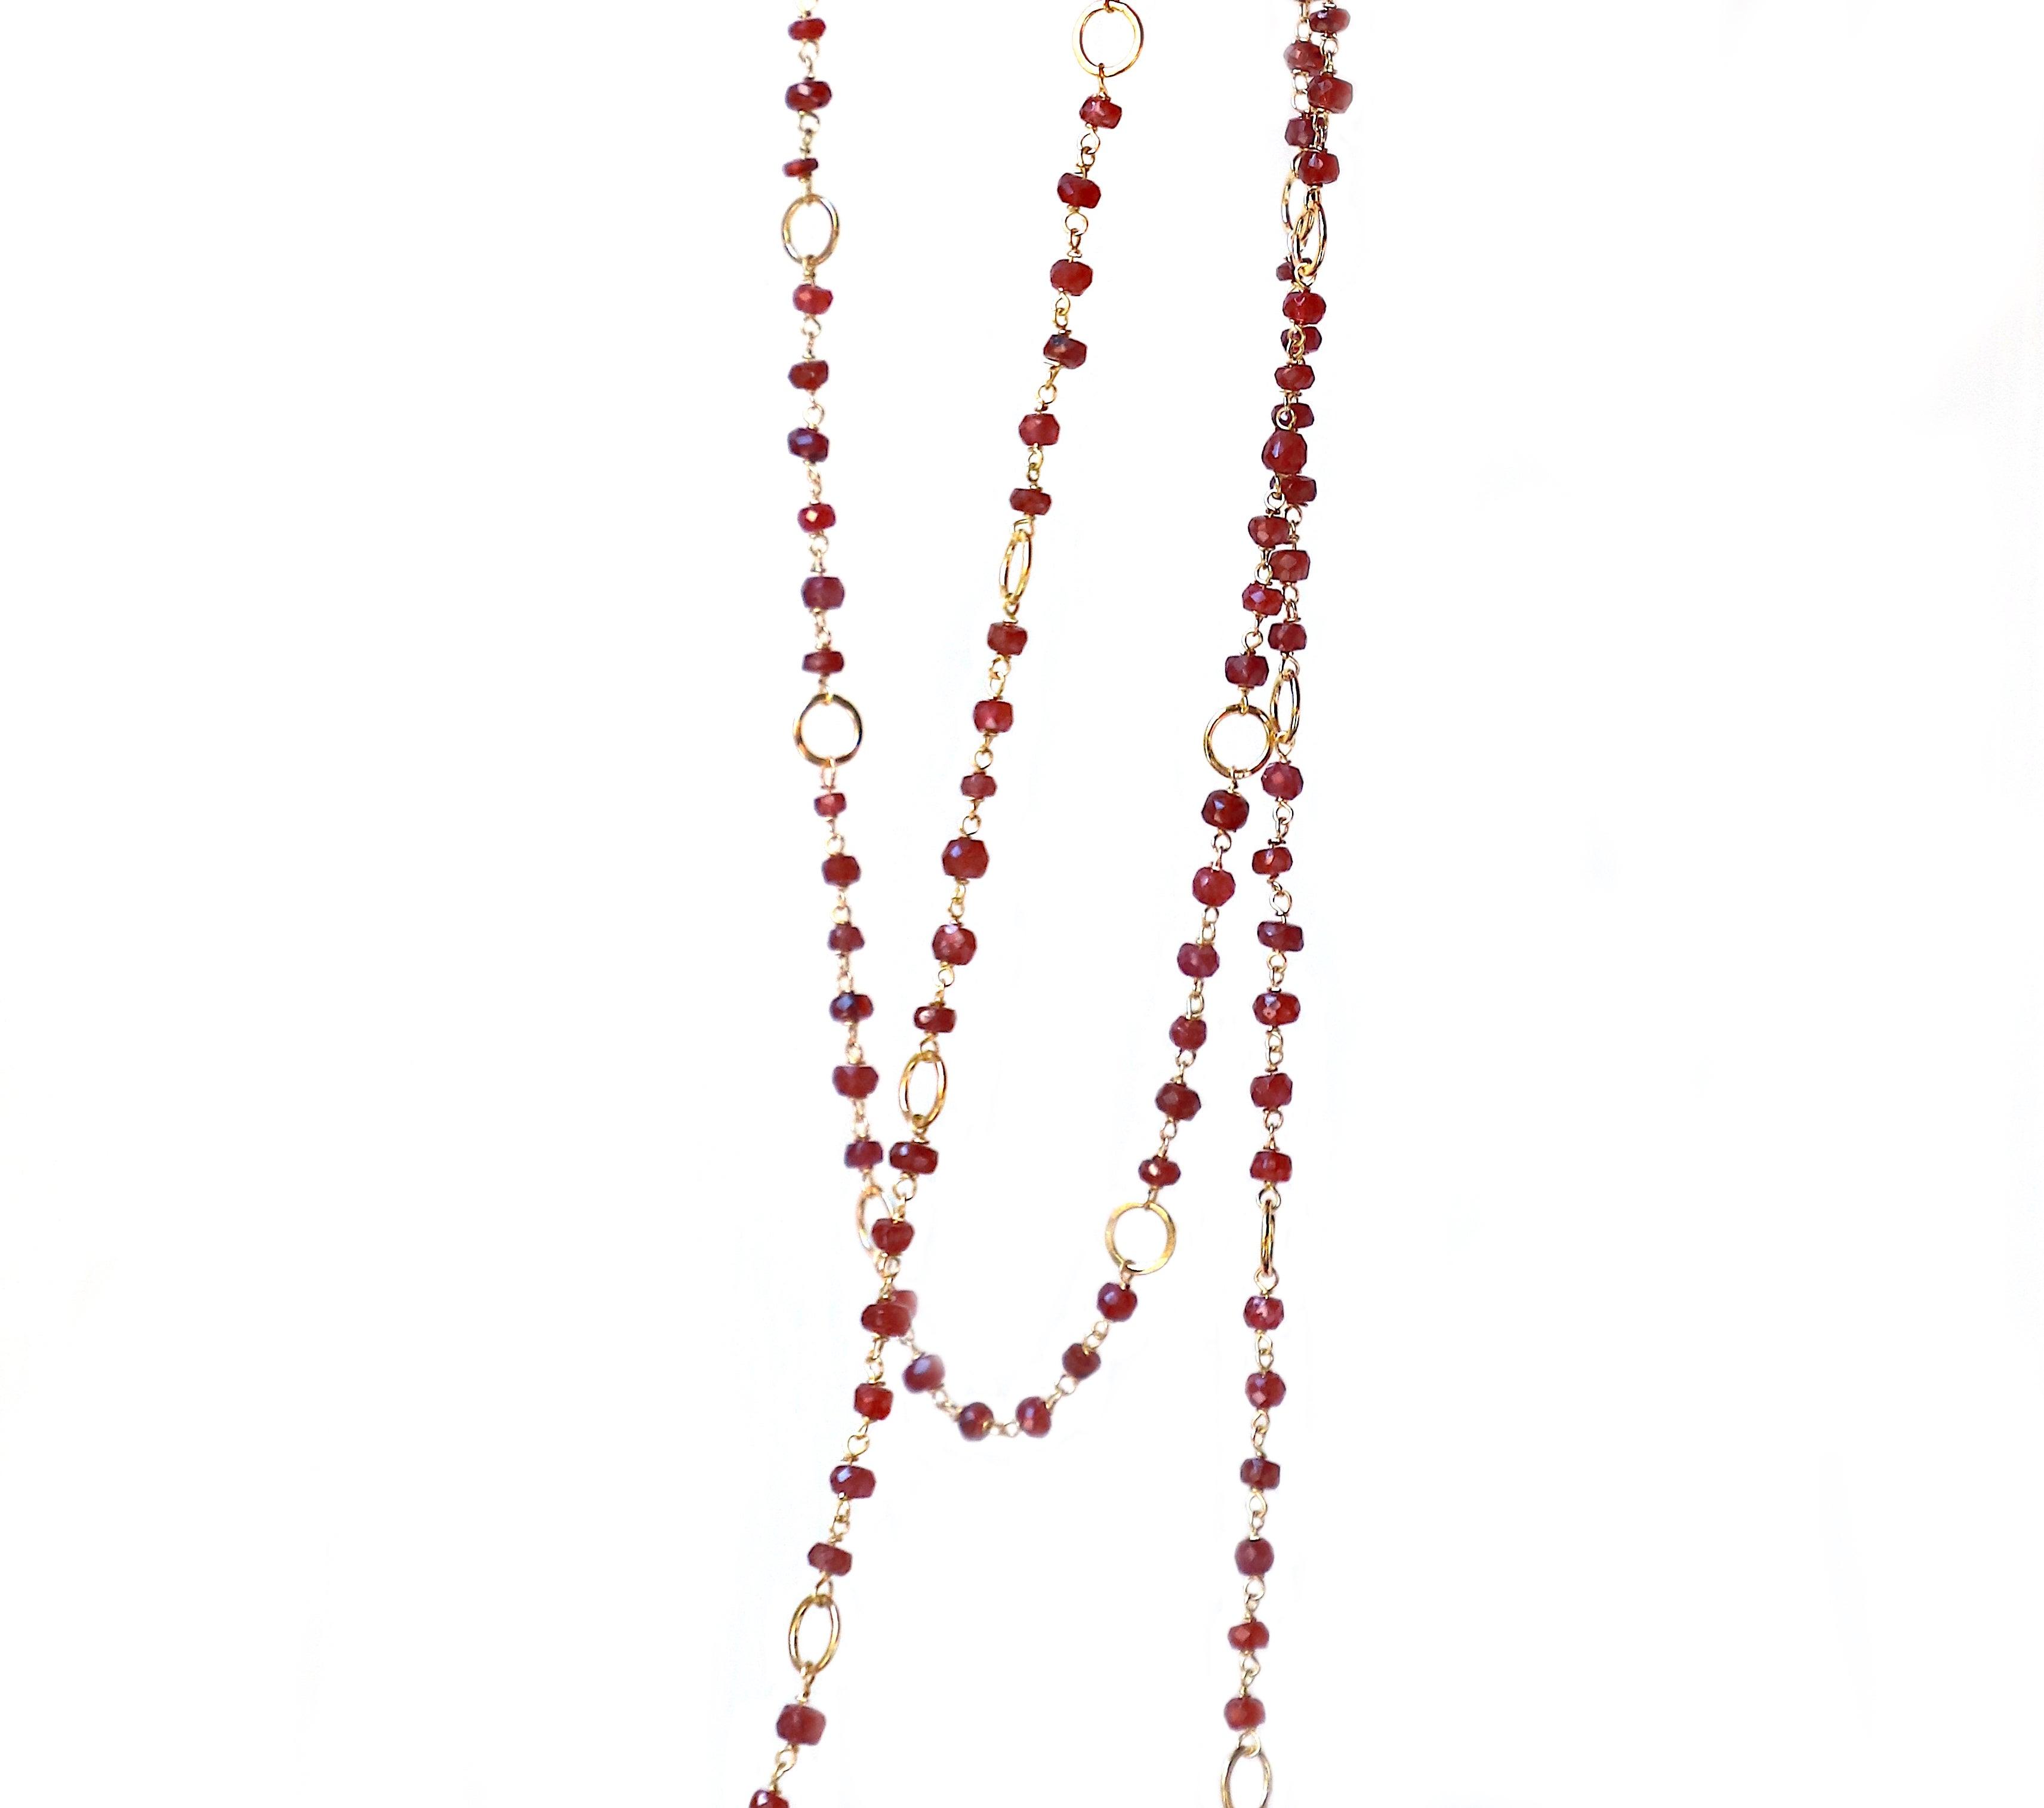 Art Deco Style 18Karat Yellow Gold Hammered Links Garnet Beaded Necklace Sautoir